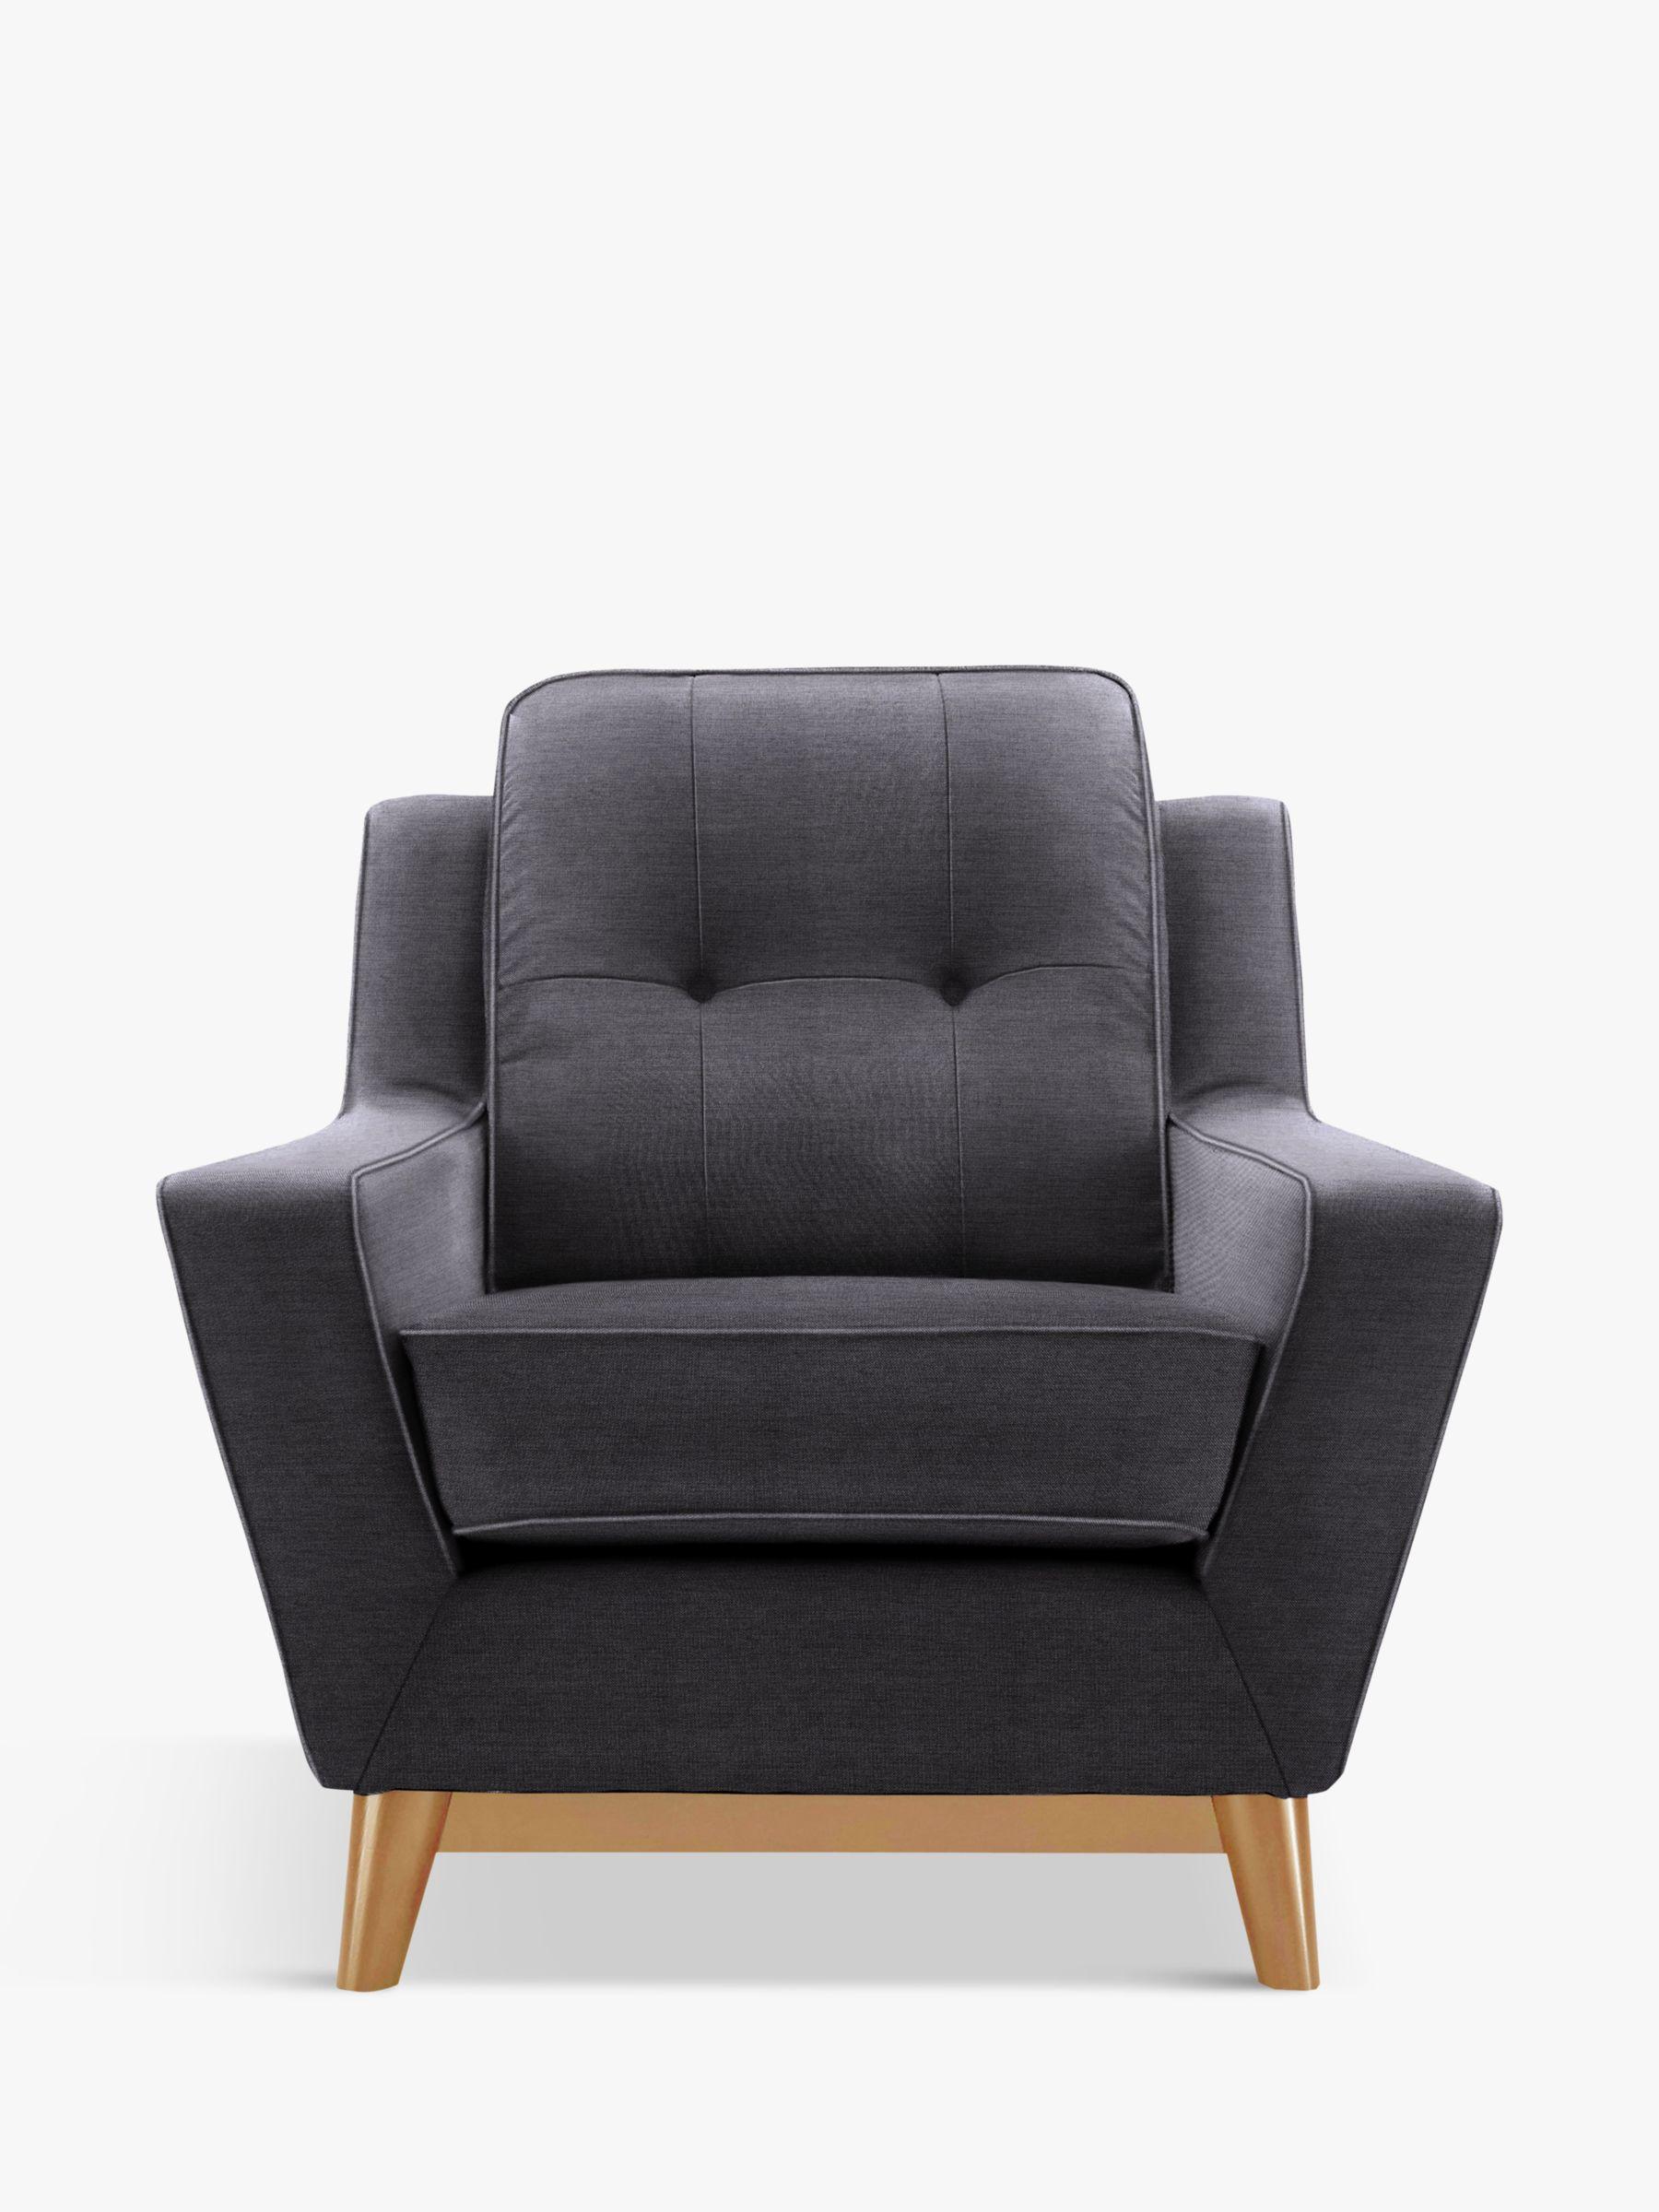 G Plan Vintage G Plan Vintage The Fifty Three Armchair